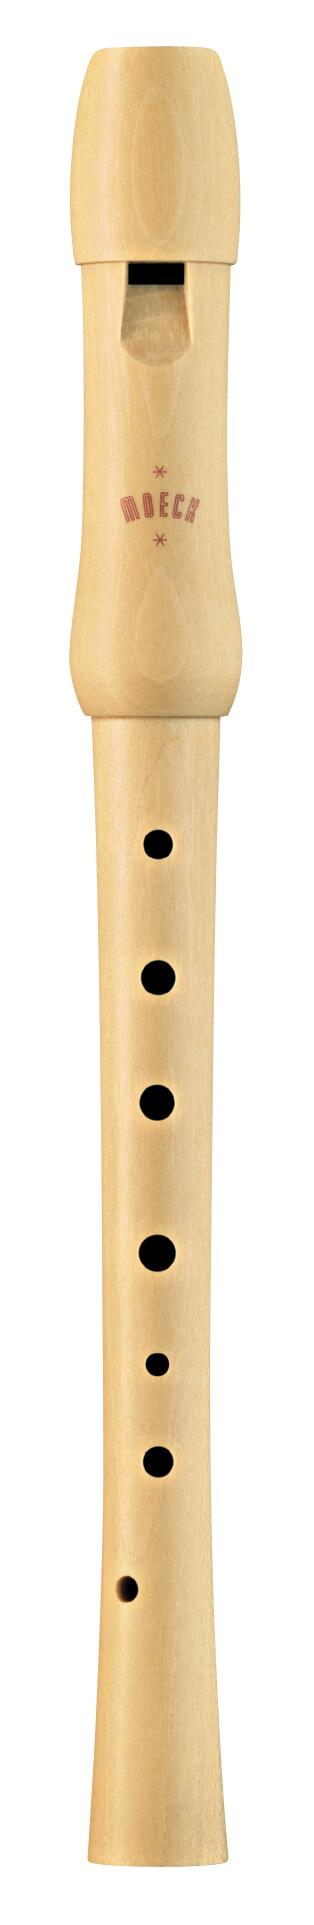 Flauta Soprano Alemana MoeckEscolar 1250 Arce